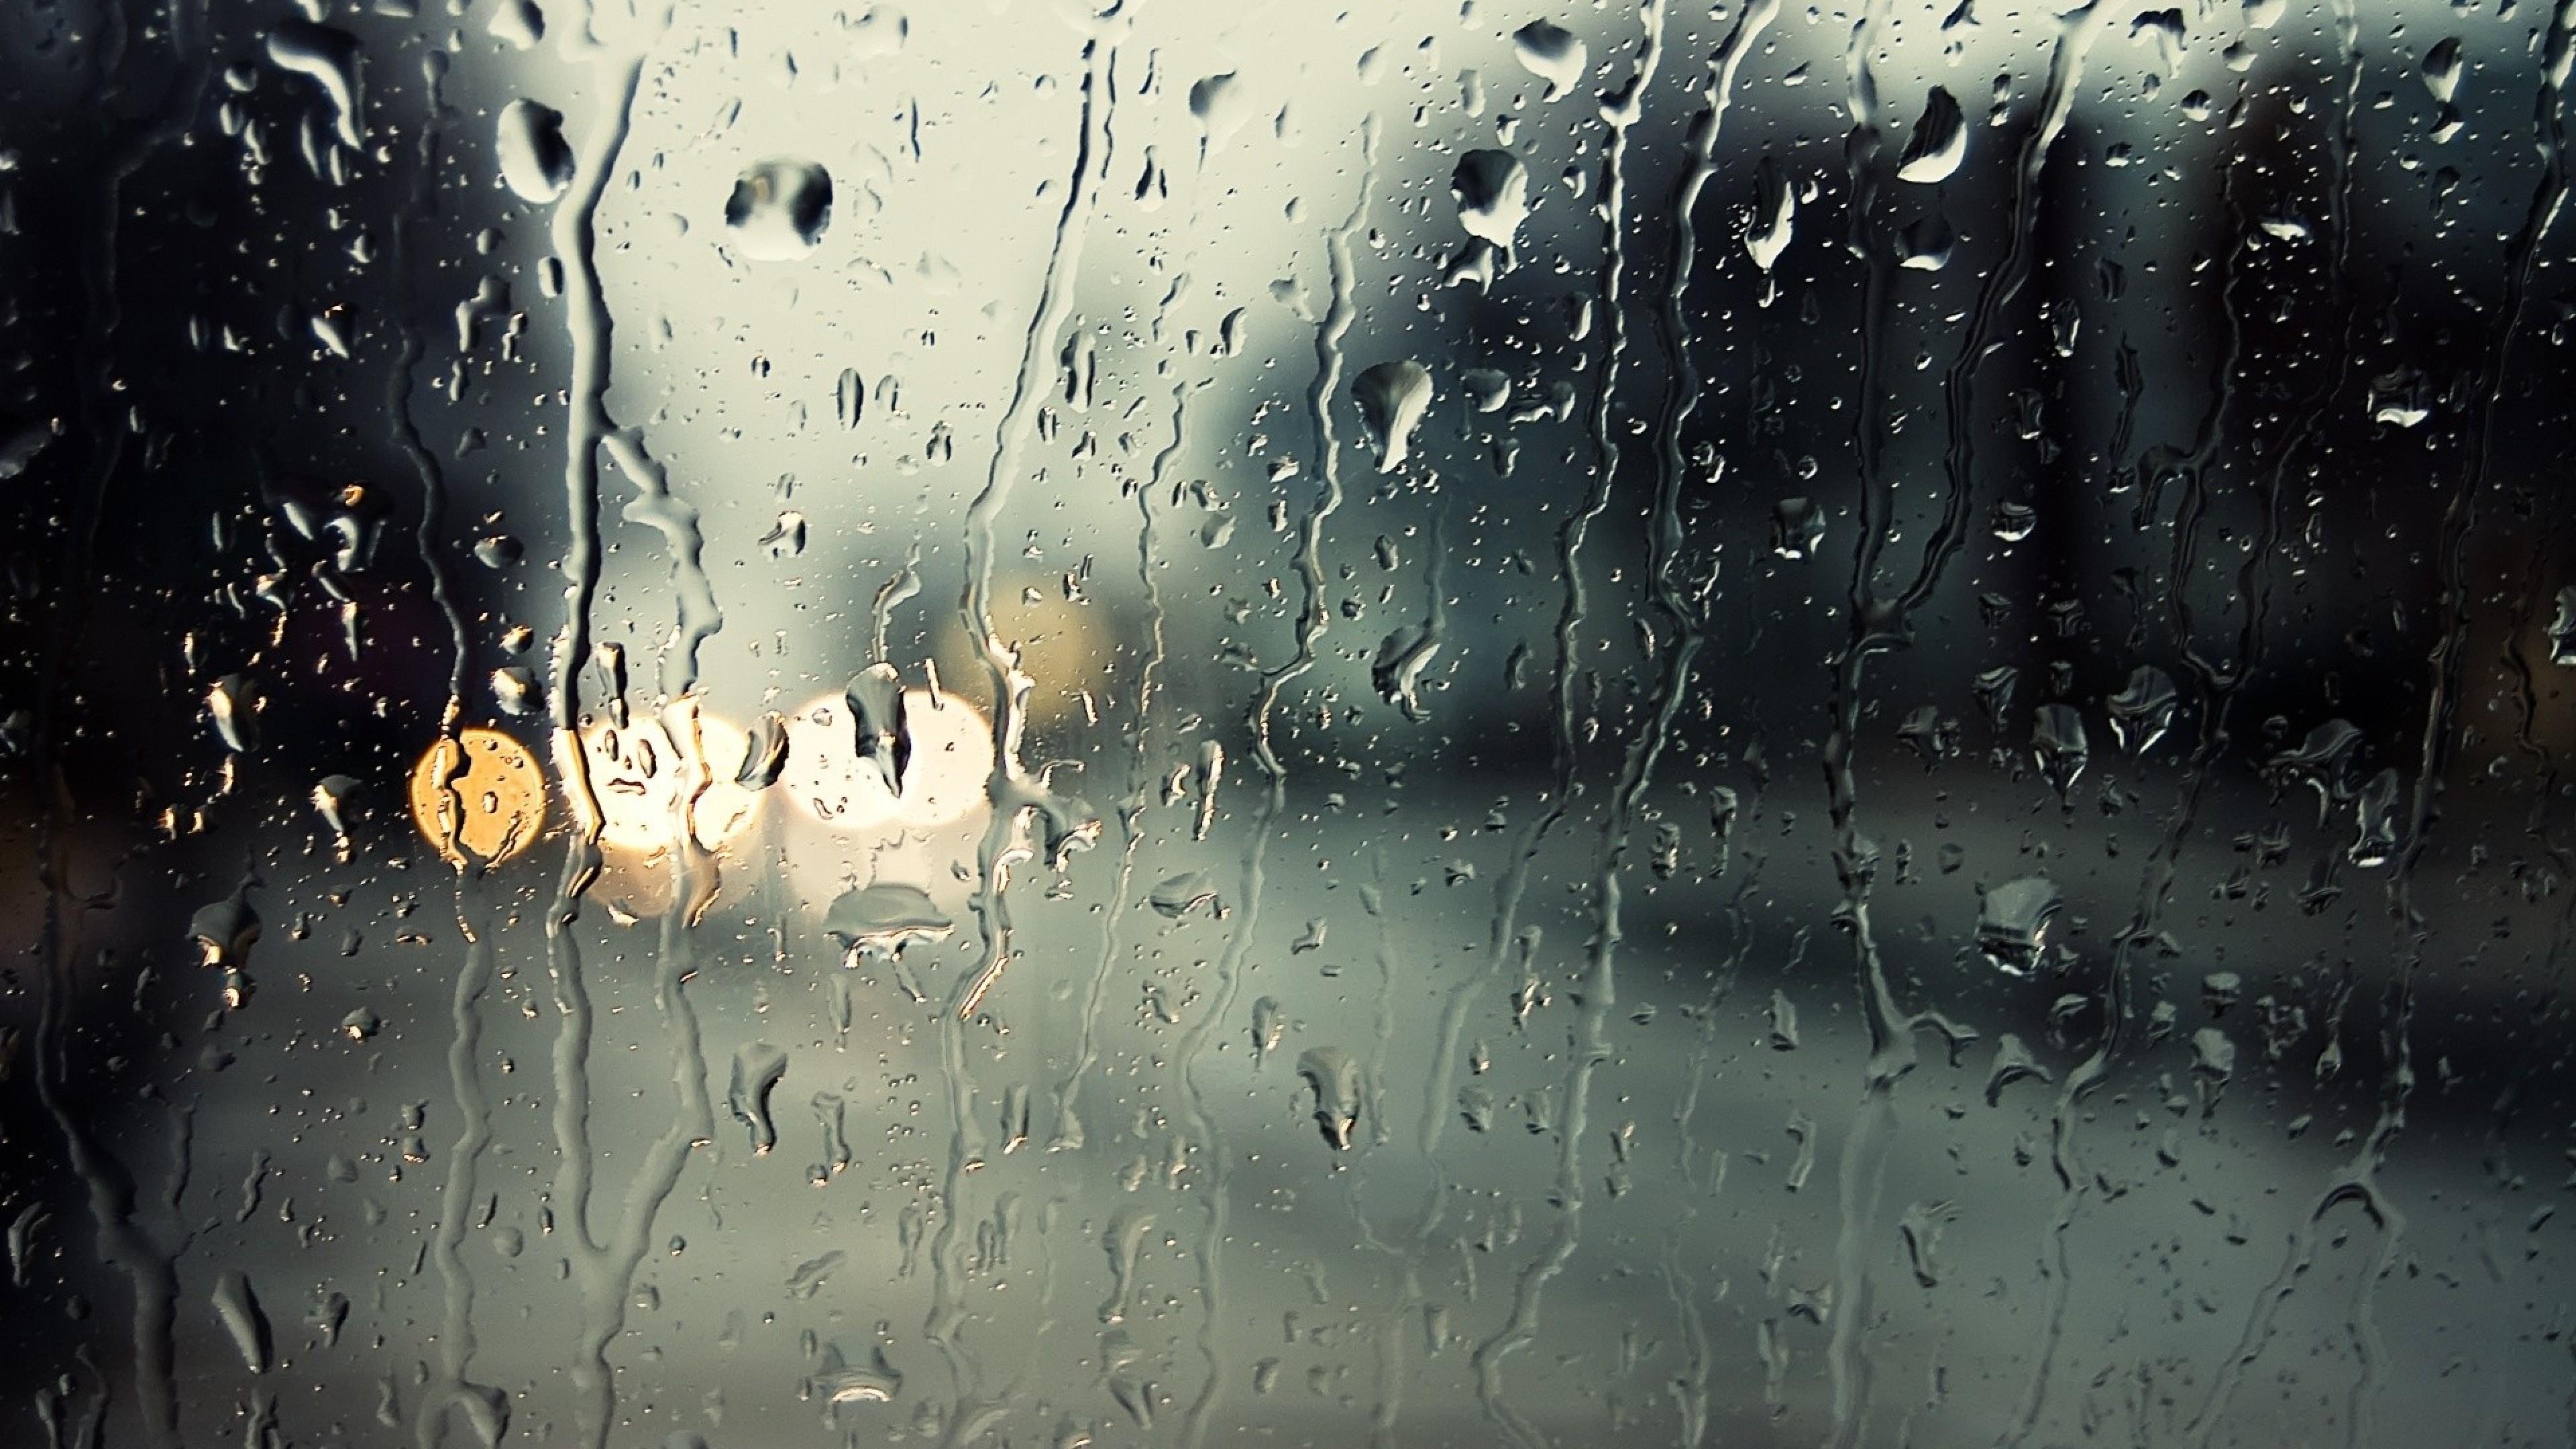 Glass, Drop, Rain, Moisture Wallpaper, Background 4K Ultra HD .